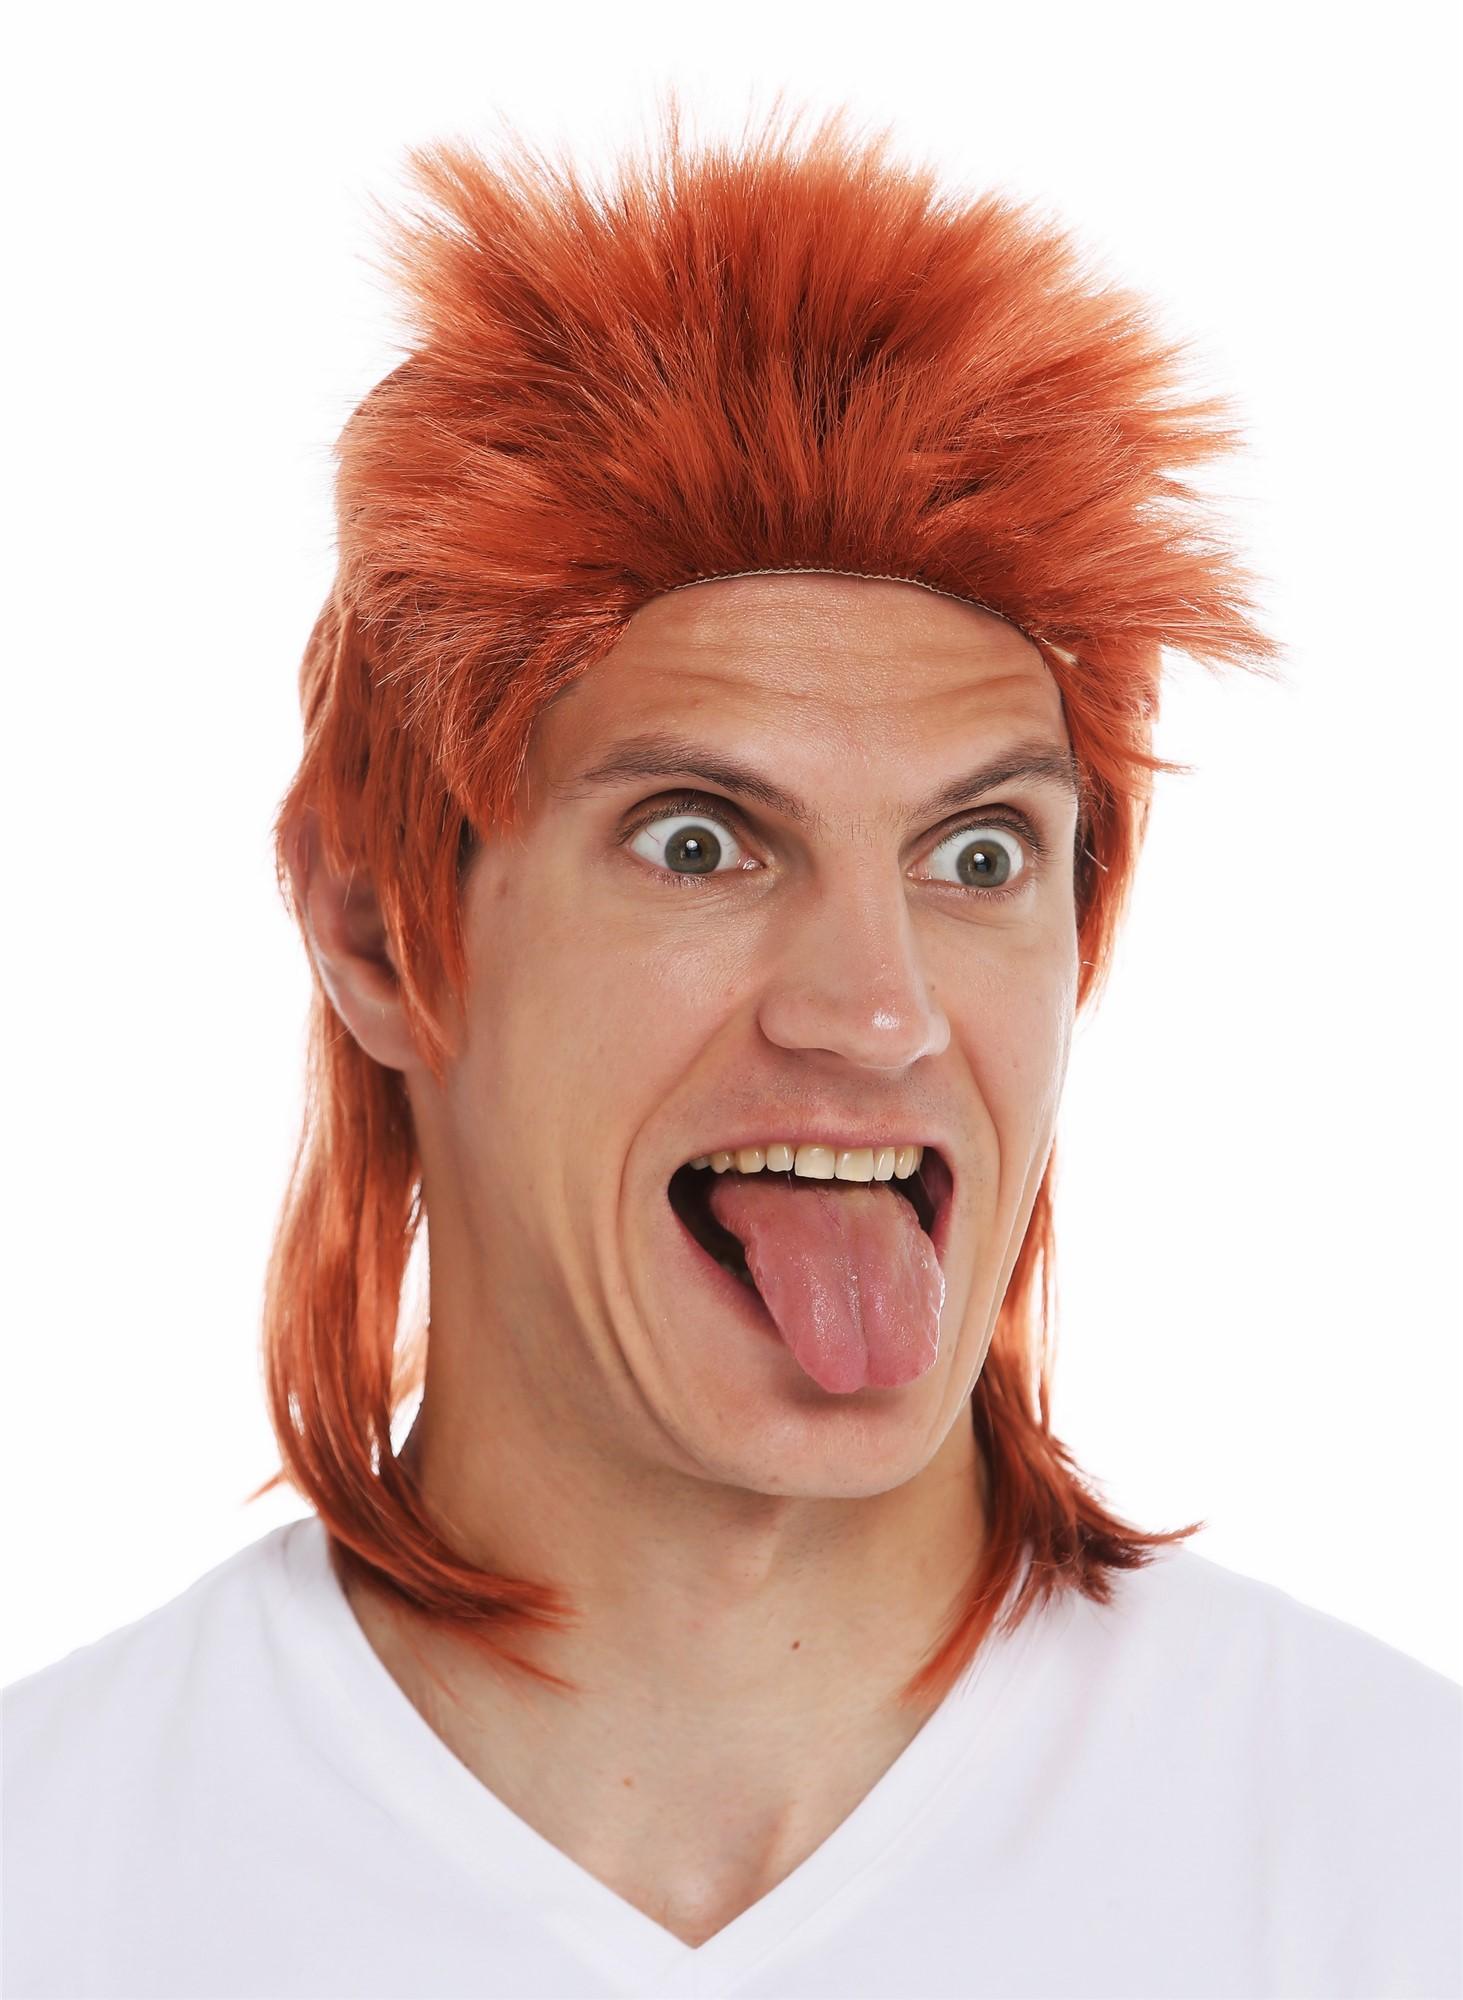 Rotes Vokuhila Stirnband mit schwarzer Perücke Vokuhilaperücke 80er Prollperücke